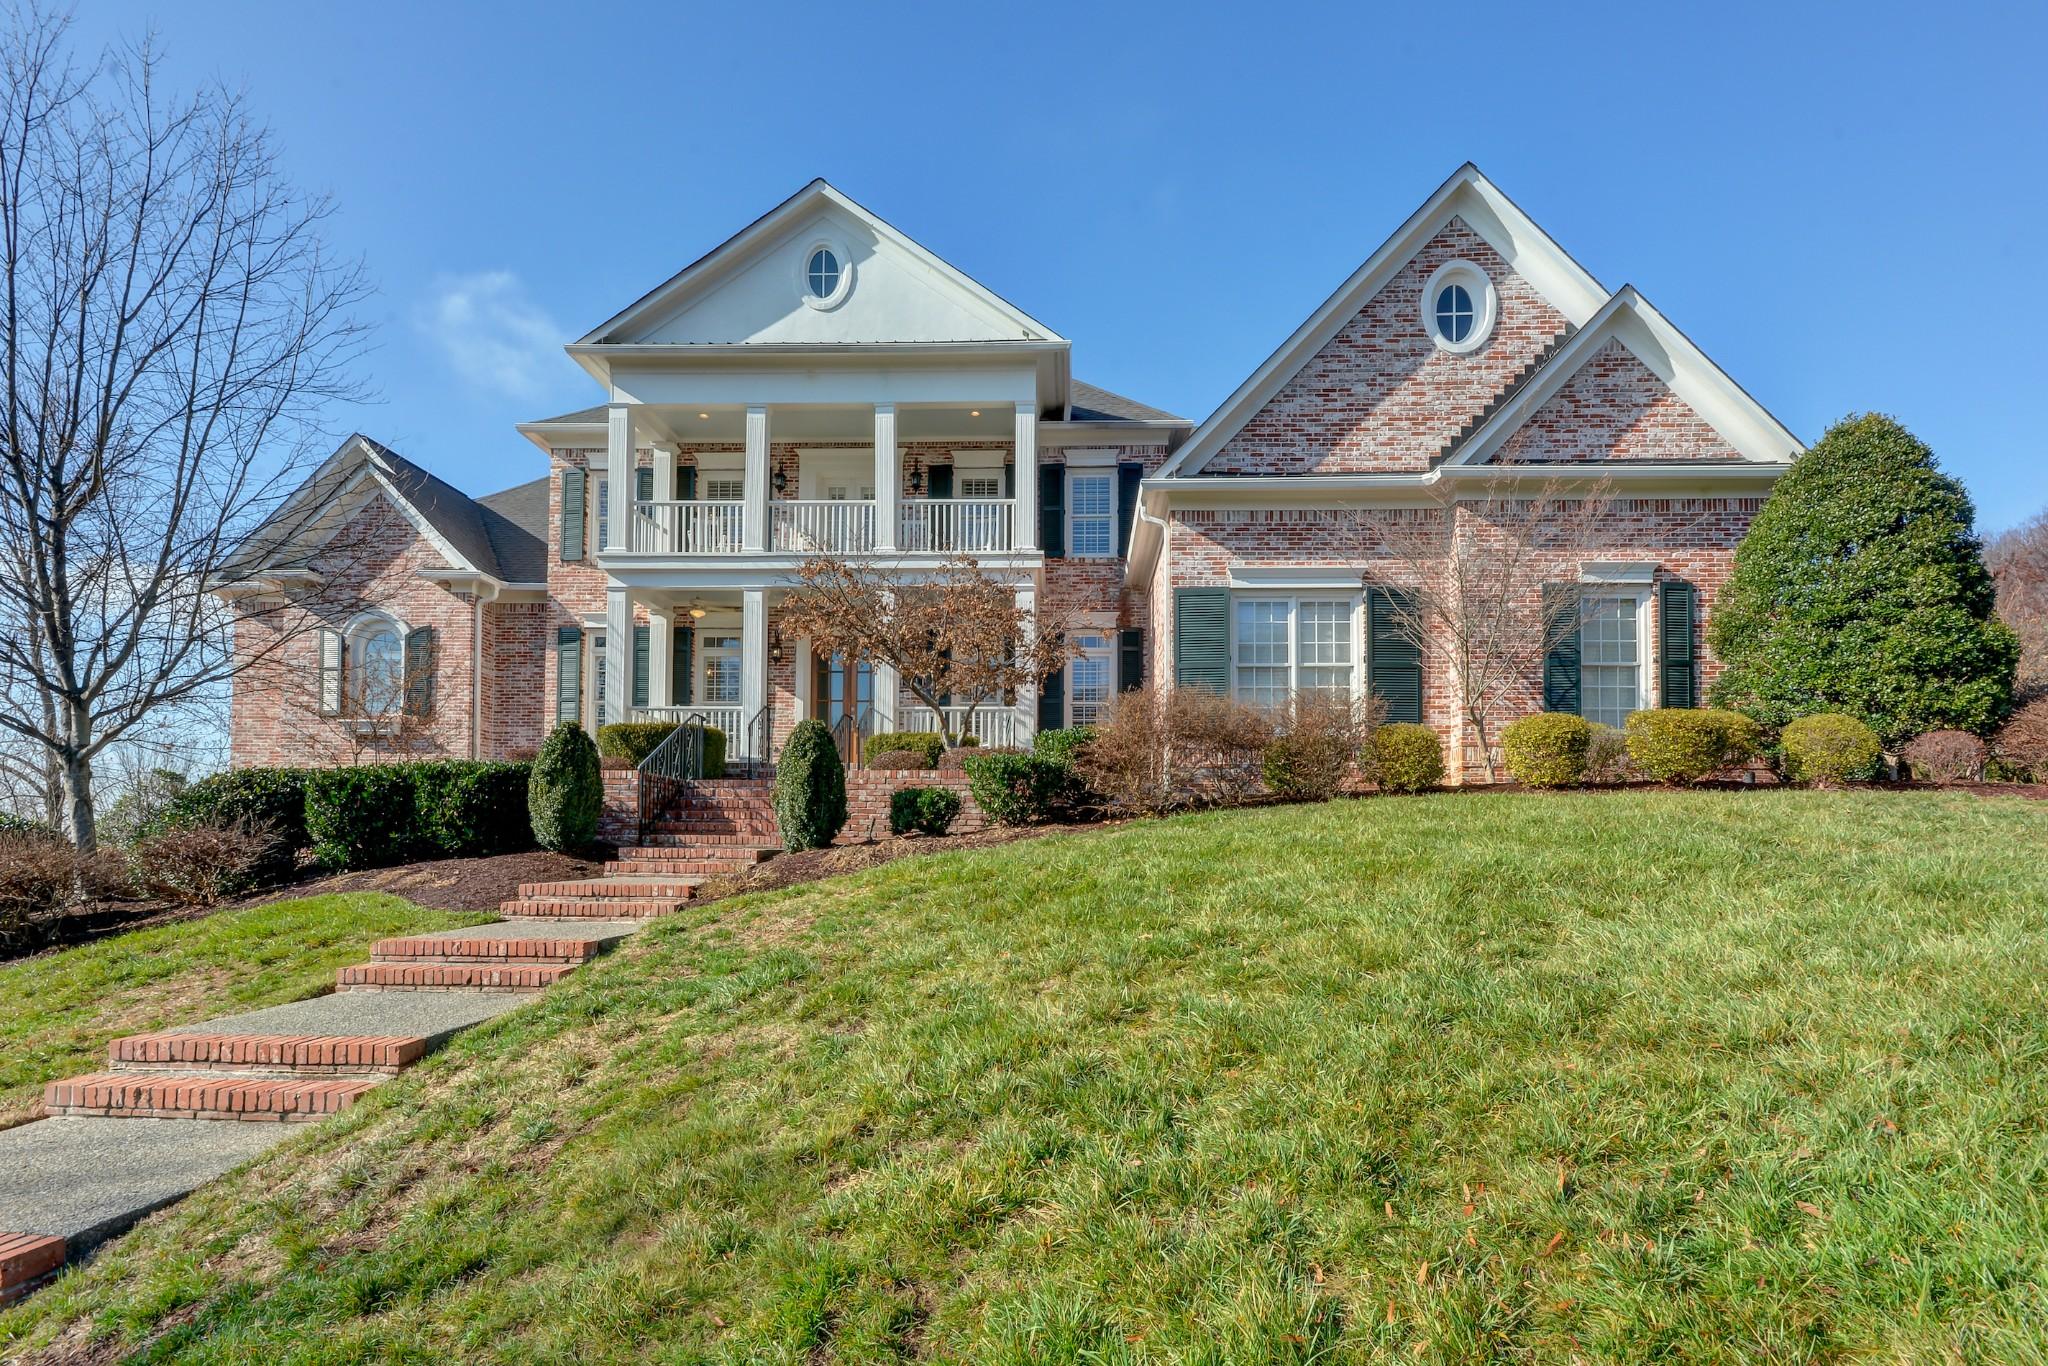 244 Chatfield Way, Franklin, TN 37067 - Franklin, TN real estate listing